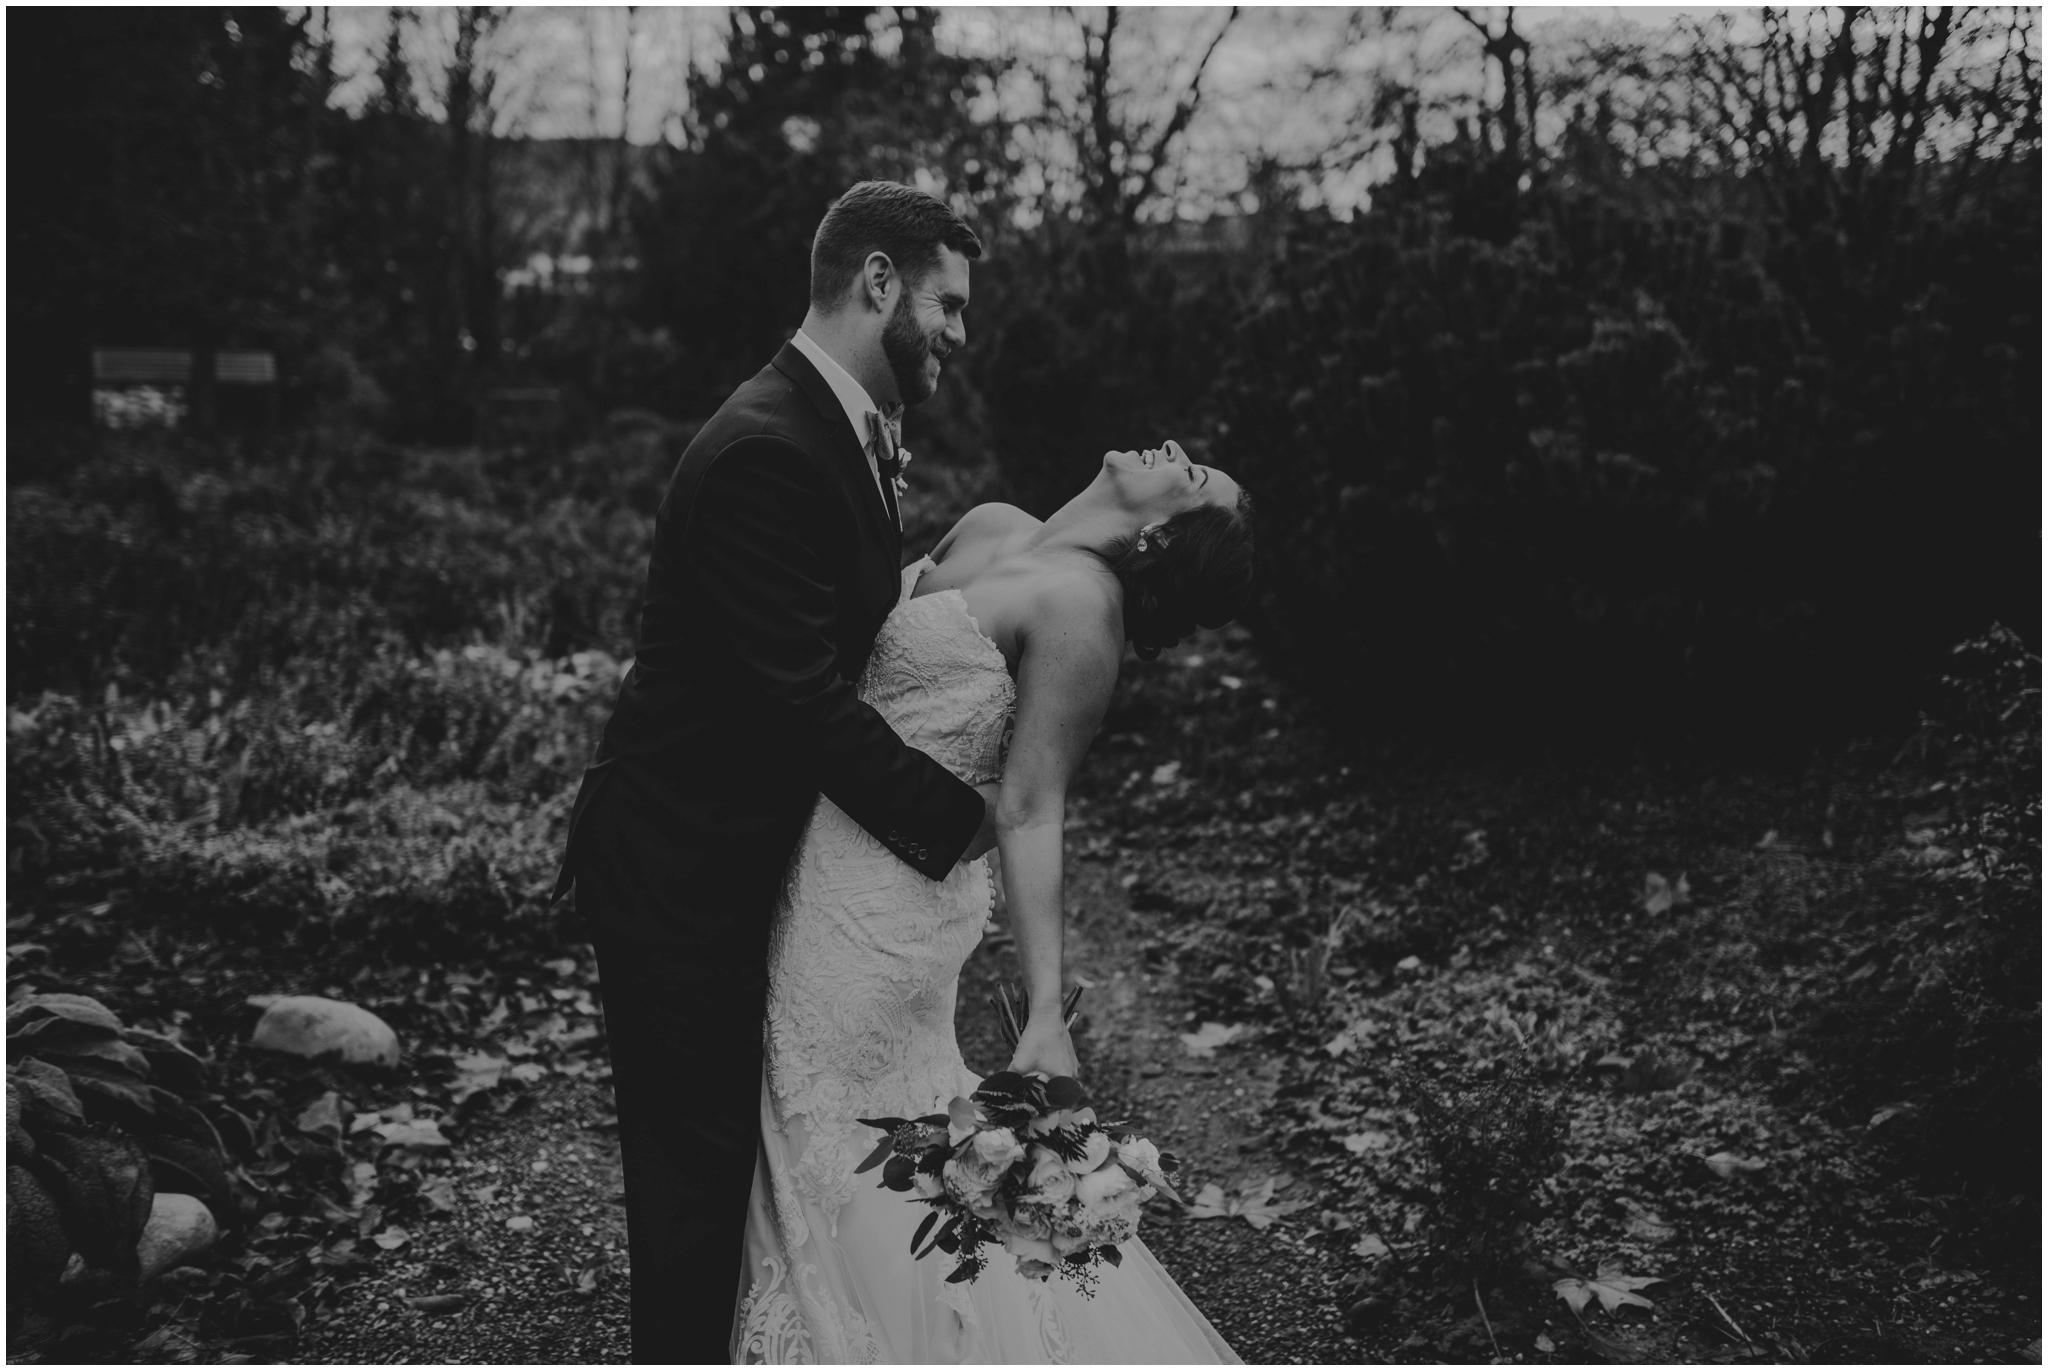 ashley-tj-the-pickering-barn-winter-wedding-seattle-photographer-044.jpg